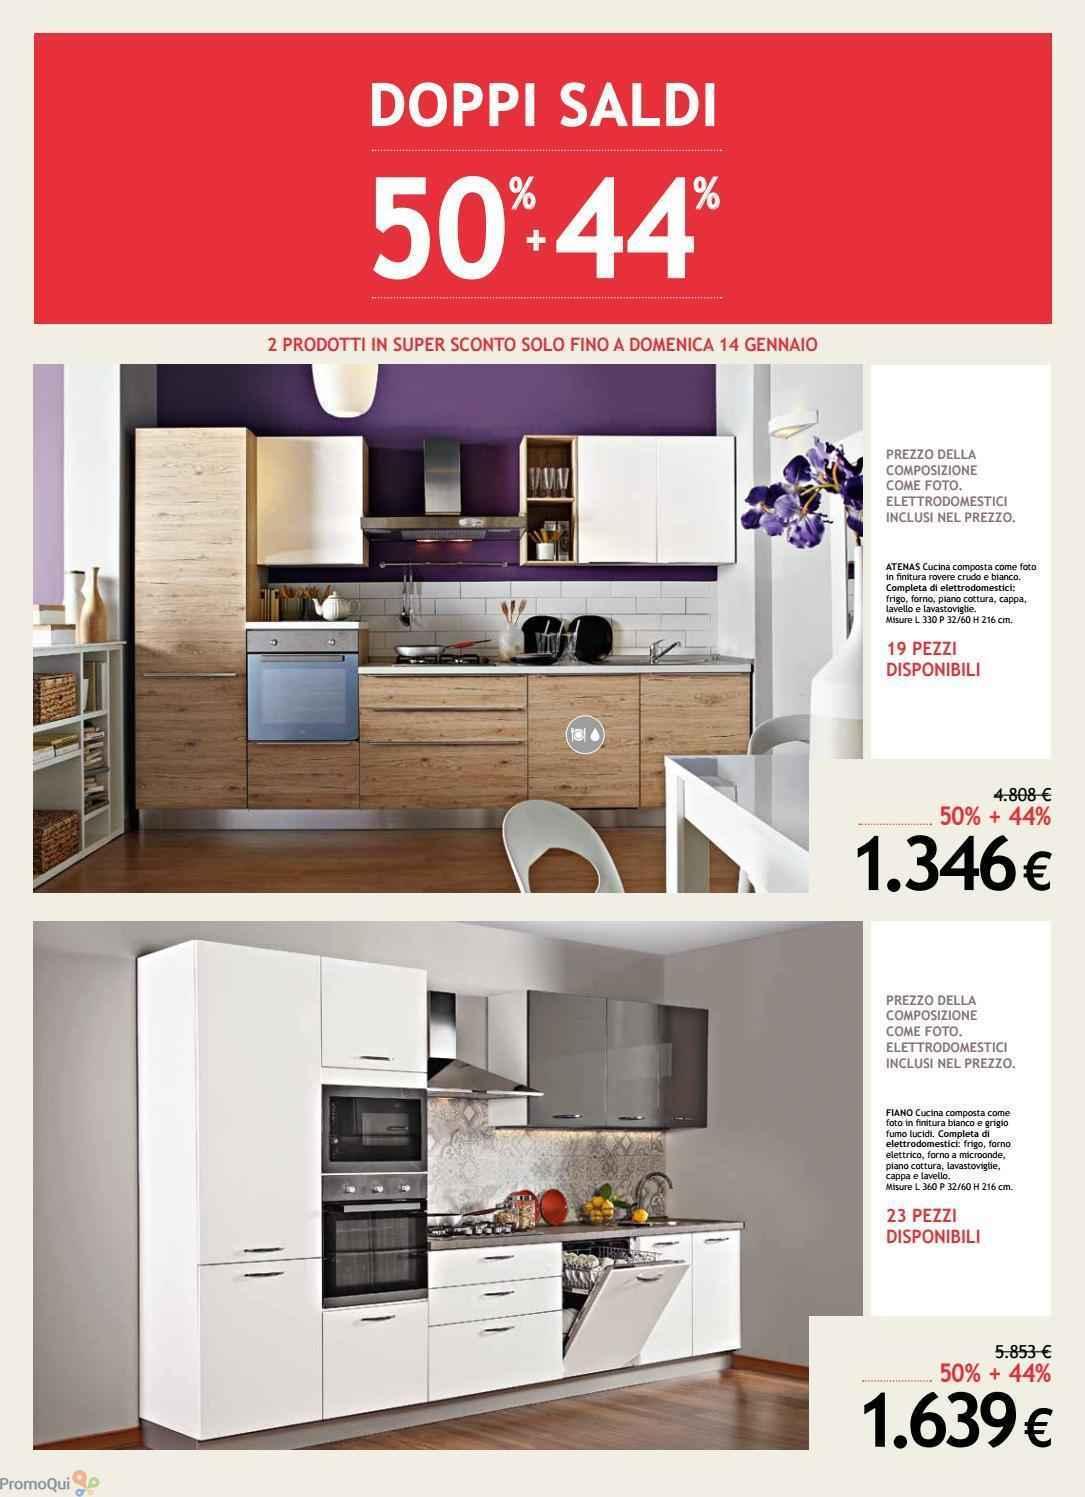 Arredamento saldi top zanotta minimalismo with for Arredamento saldi